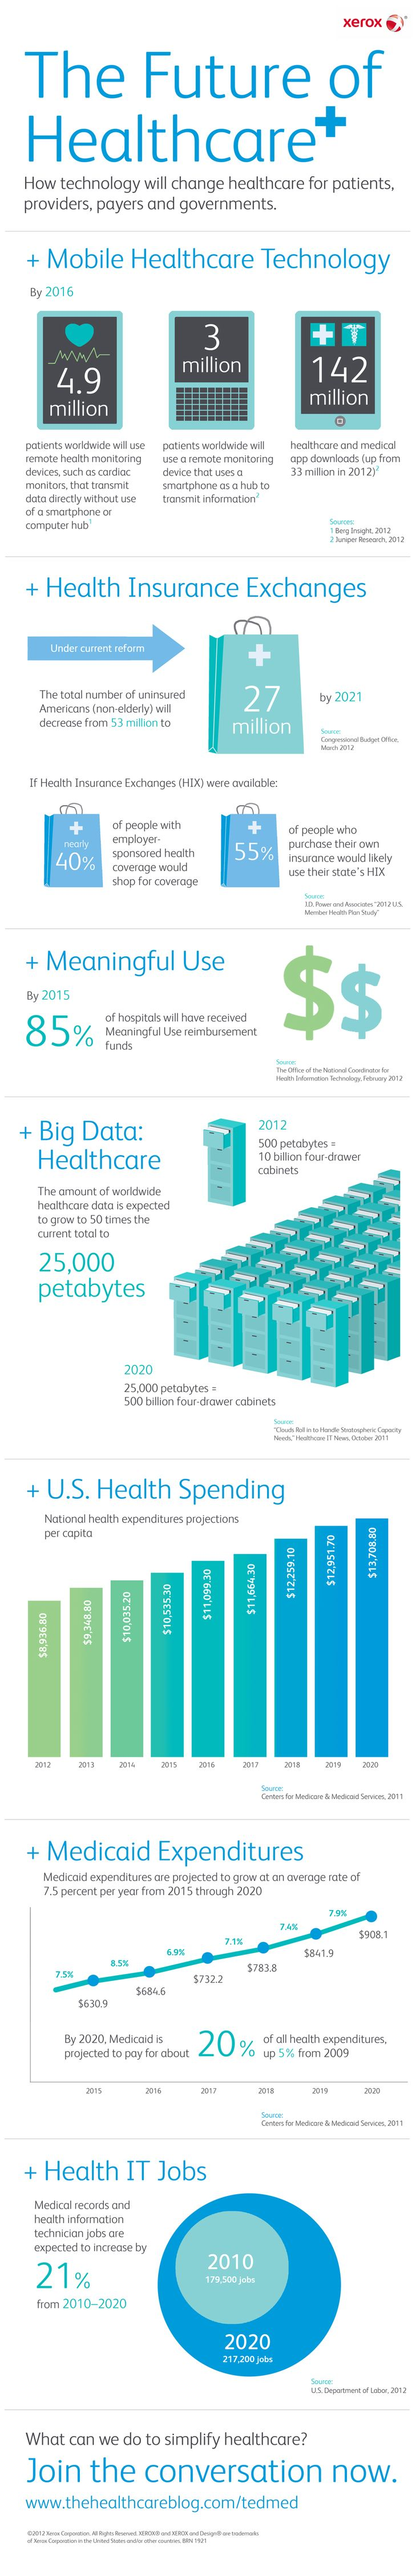 Future-of-Healthcare-infographic